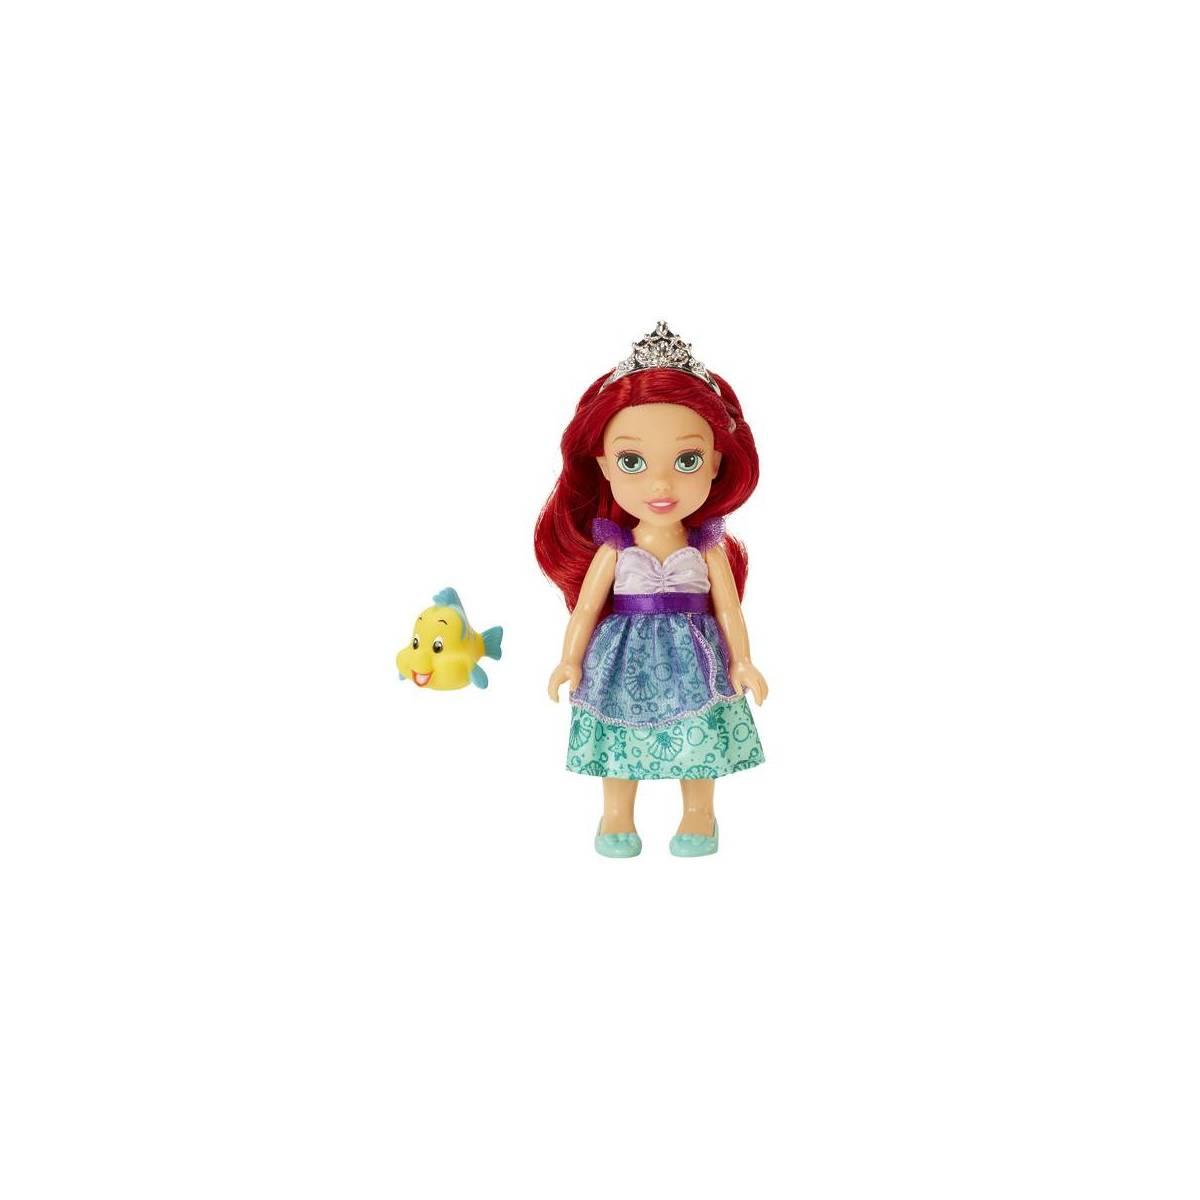 Petite Poupée Ariel Princesse Disney - 15 cm